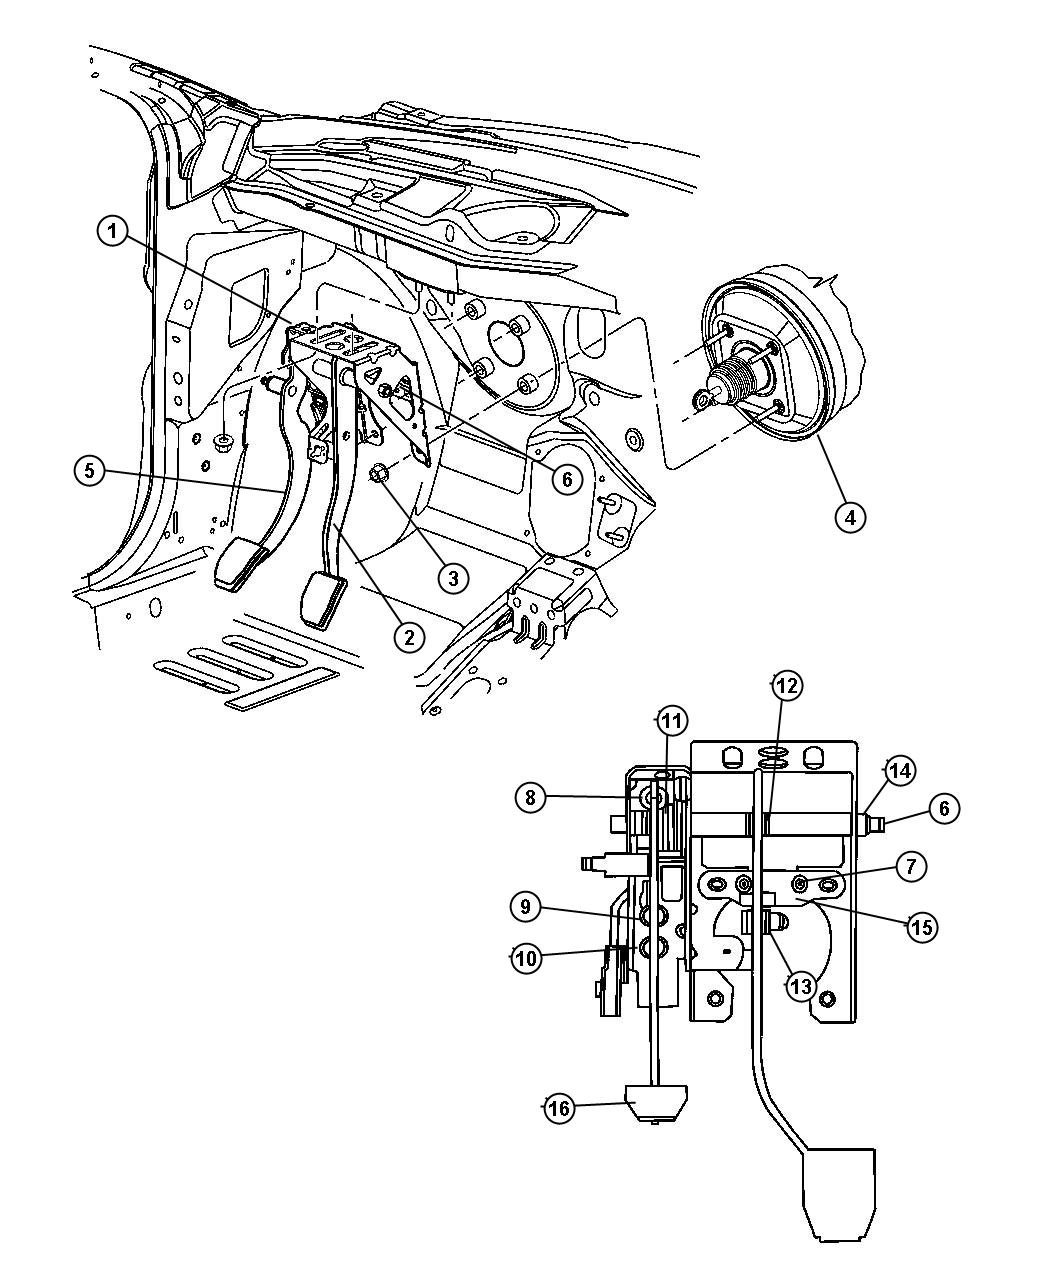 Service manual [2009 Chrysler Pt Cruiser Transmission Line